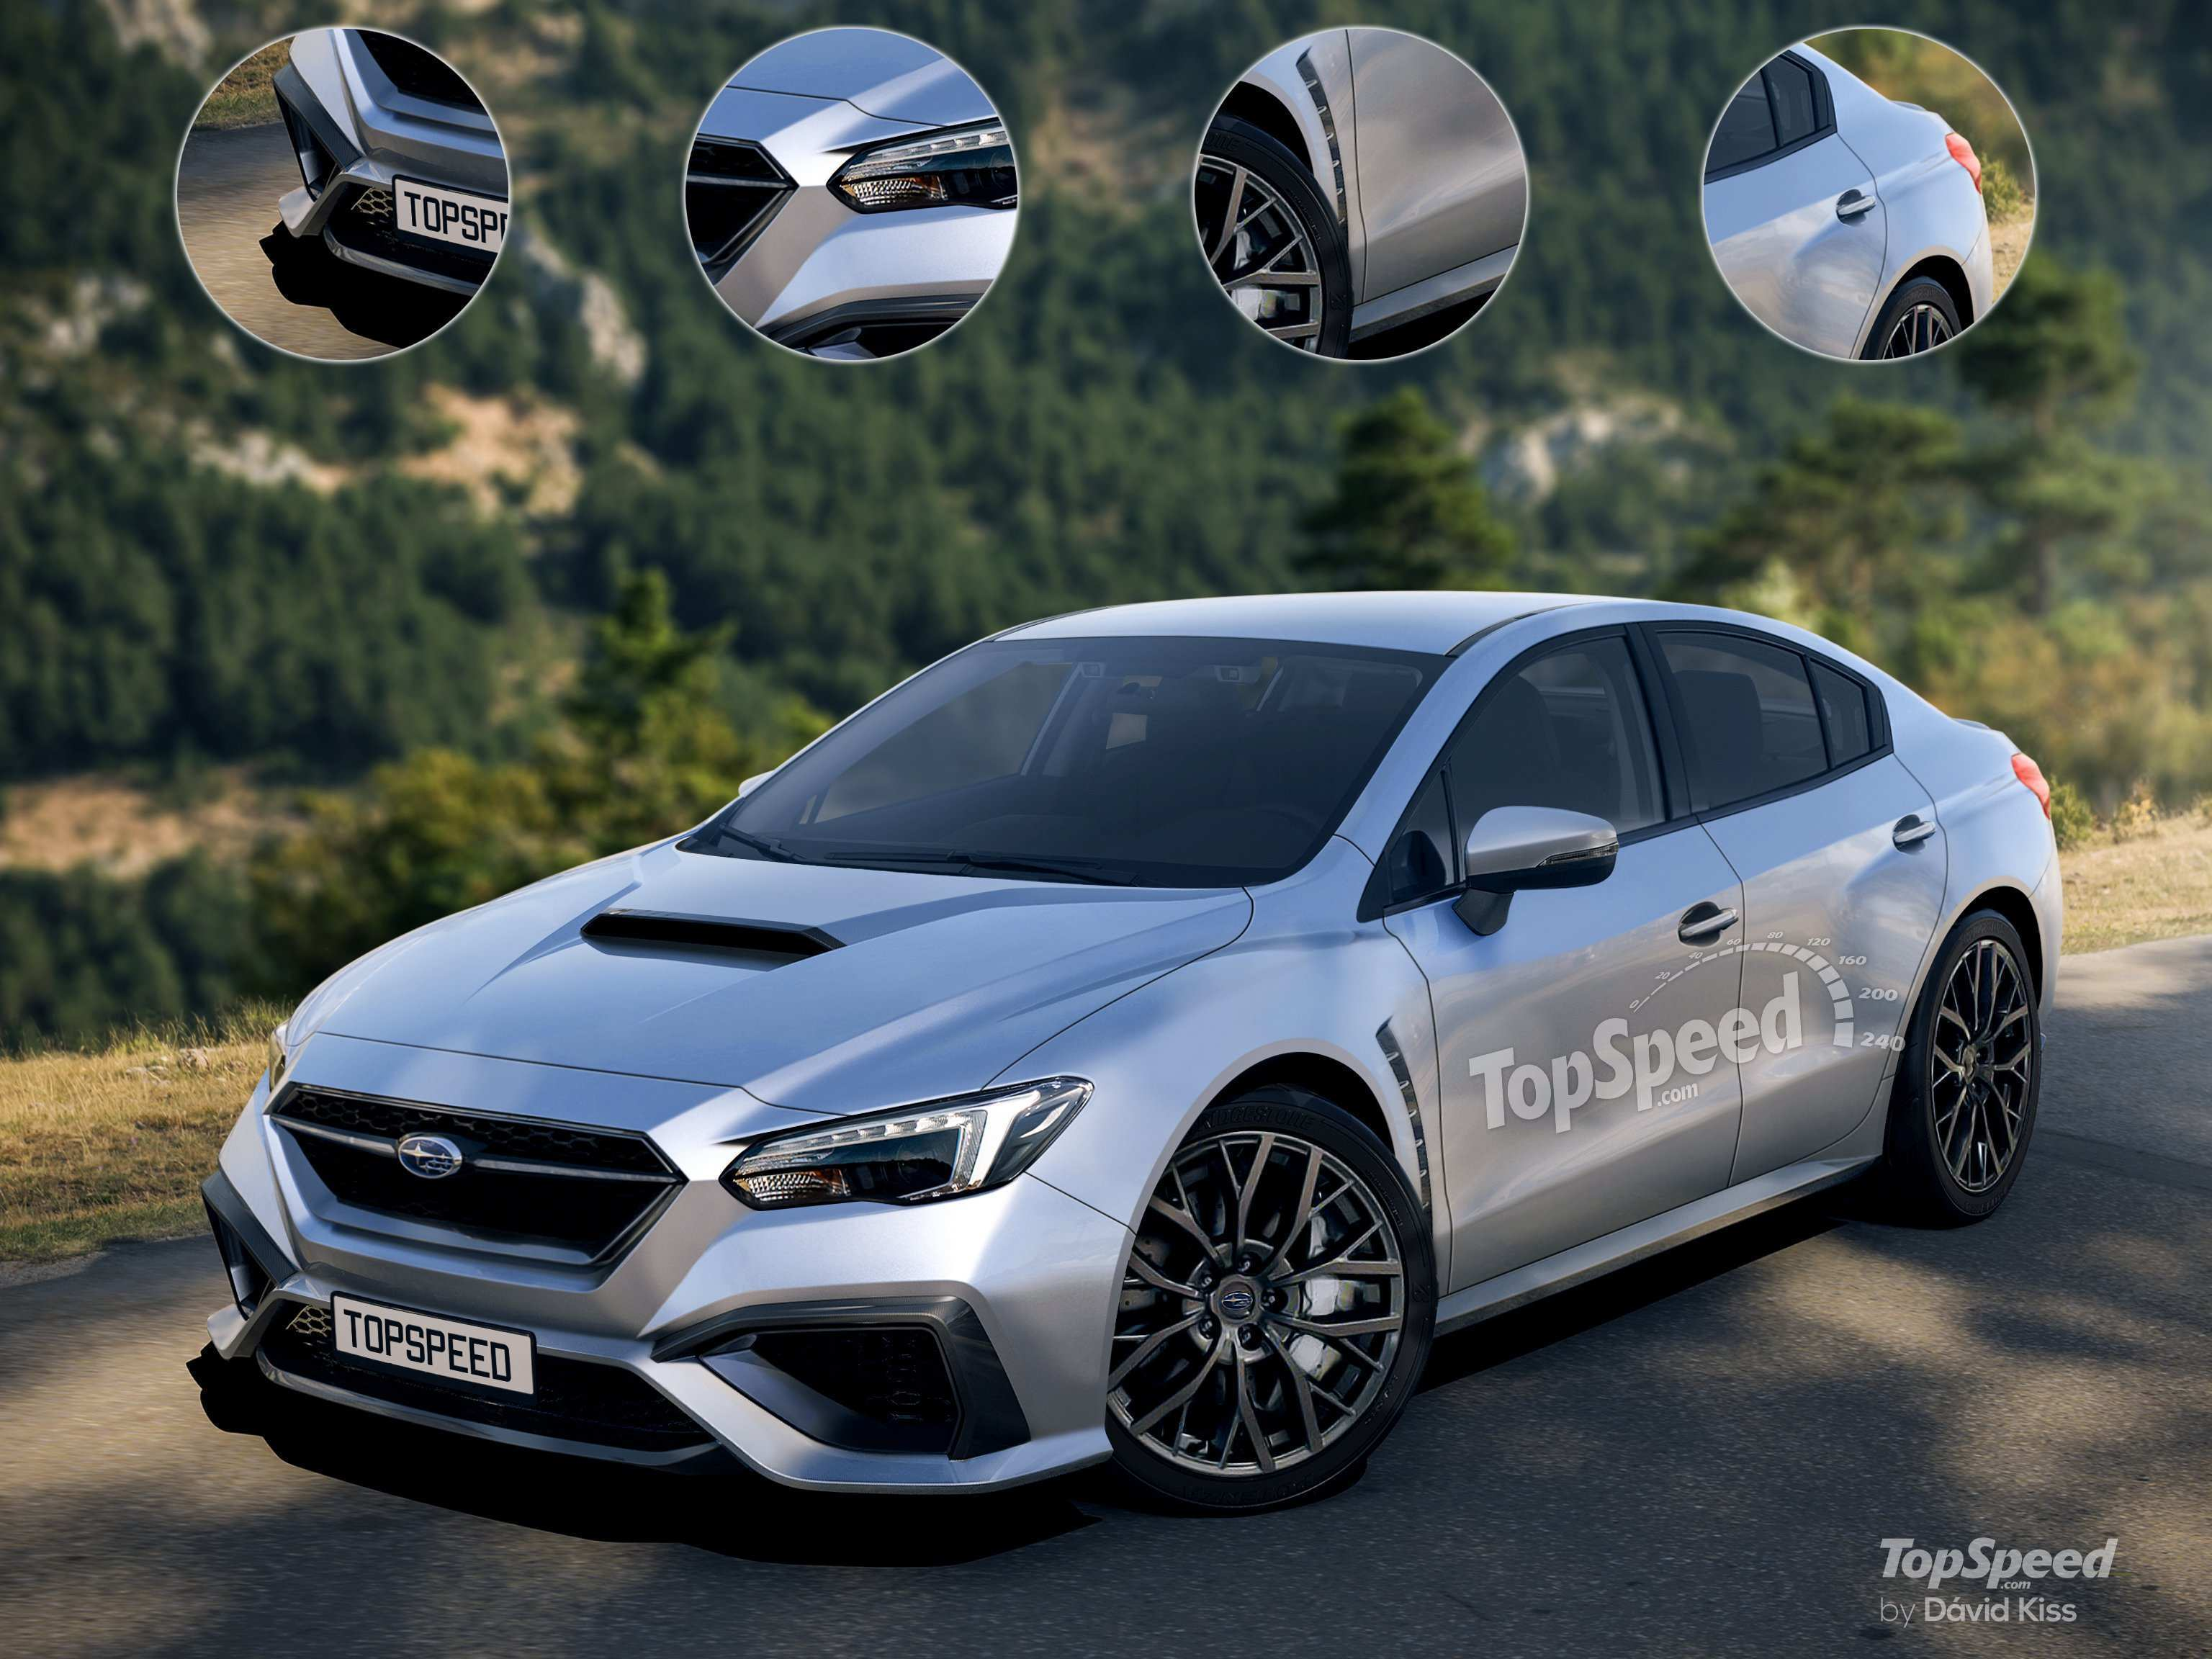 70 All New Subaru Electric Car 2020 Review for Subaru Electric Car 2020